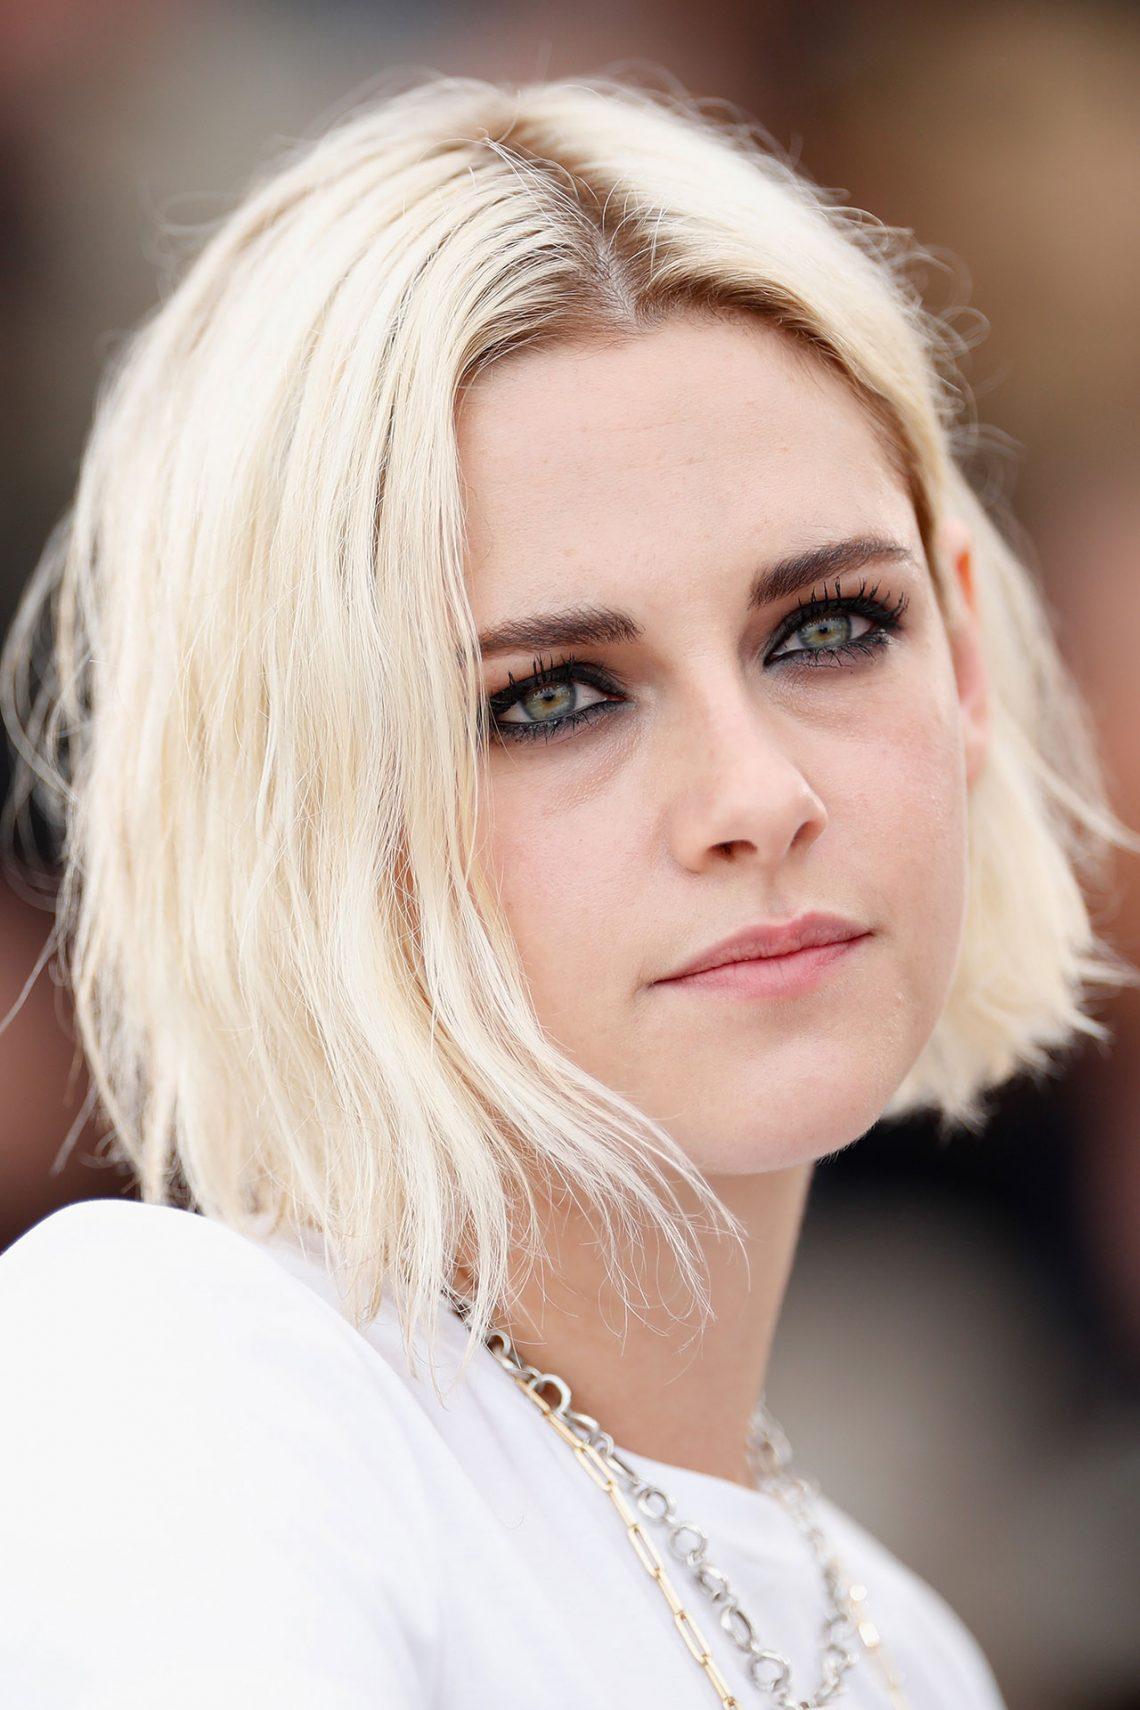 Short haircut for Women 2019, 2019 hair color trend hairstyle trend, Straight Hairstyles, short hairstyles, hairstyles for short length hair, pixie haircut for thick hair